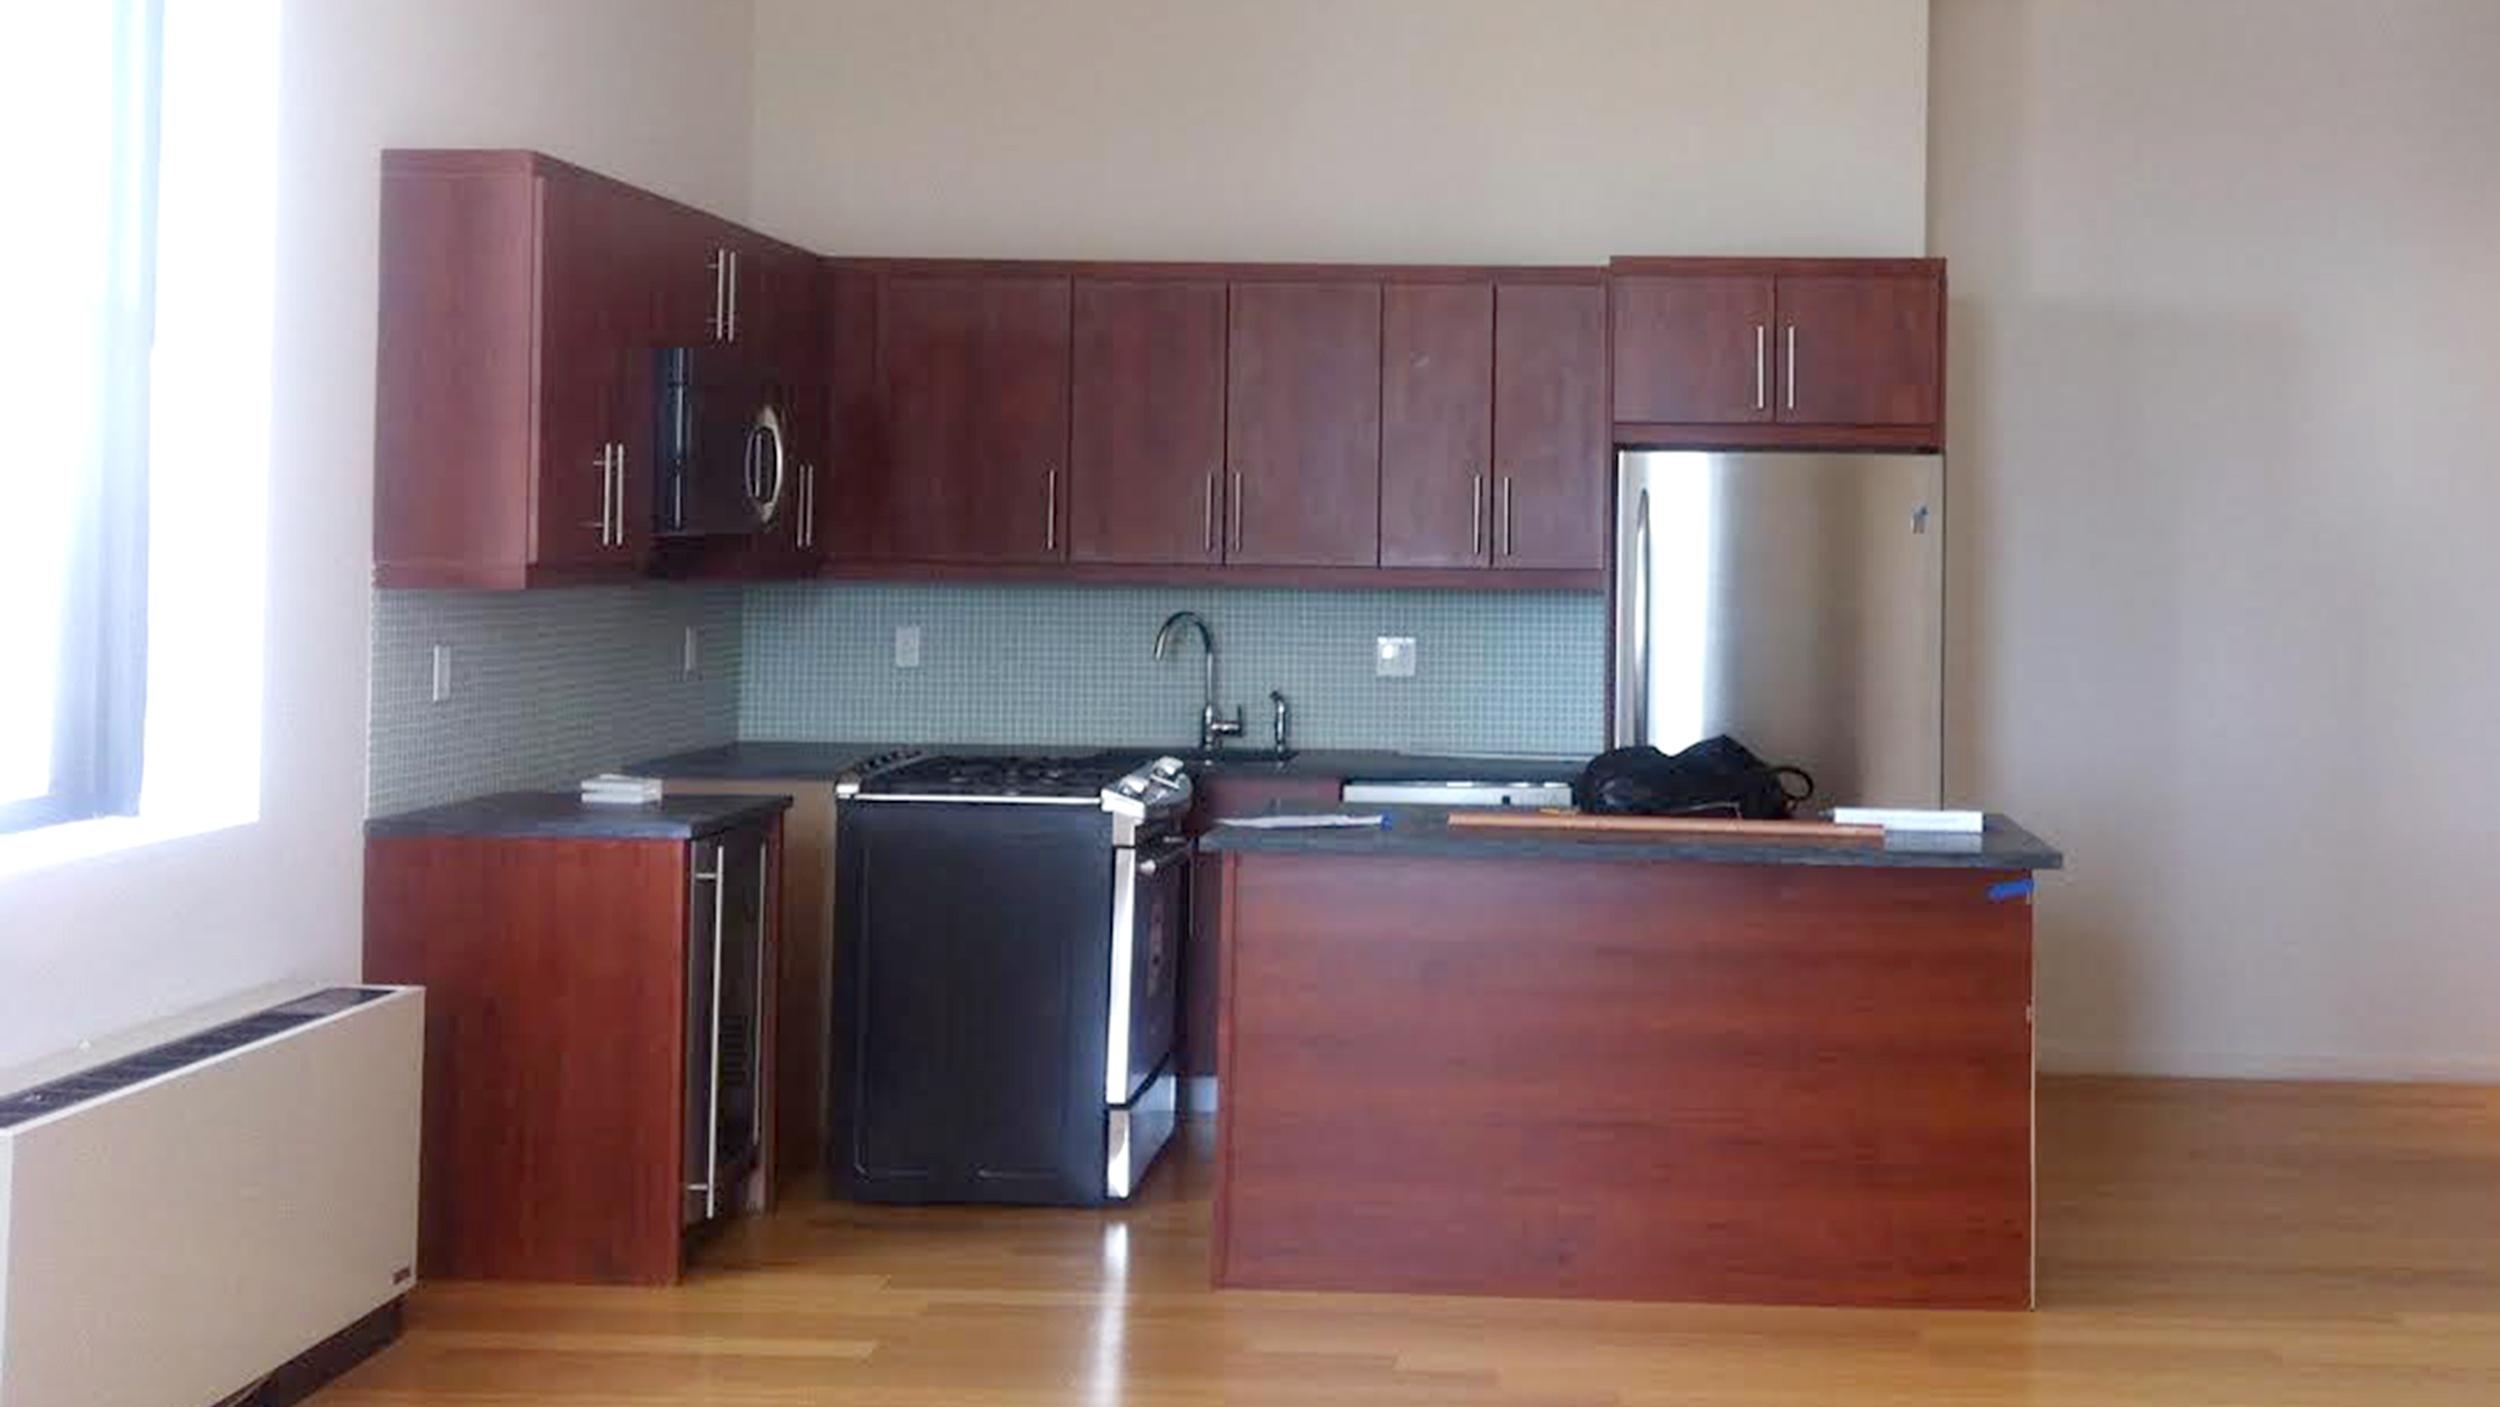 Apartment makeover: Kitchen and hallway Interior Ideas